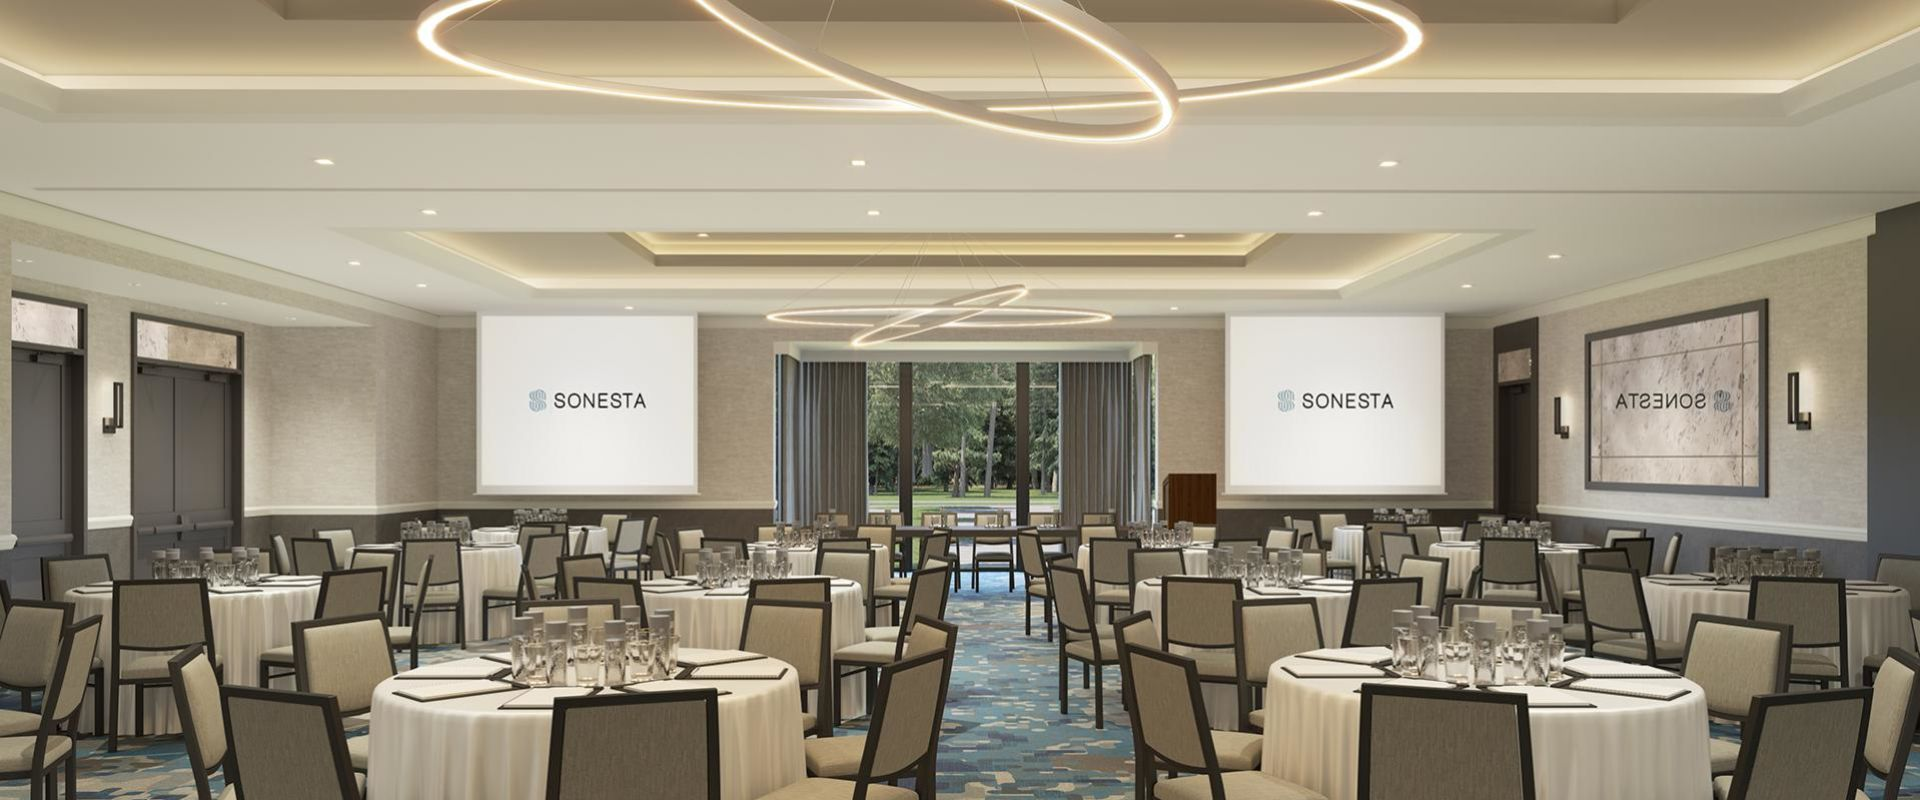 New Sonesta Event Center